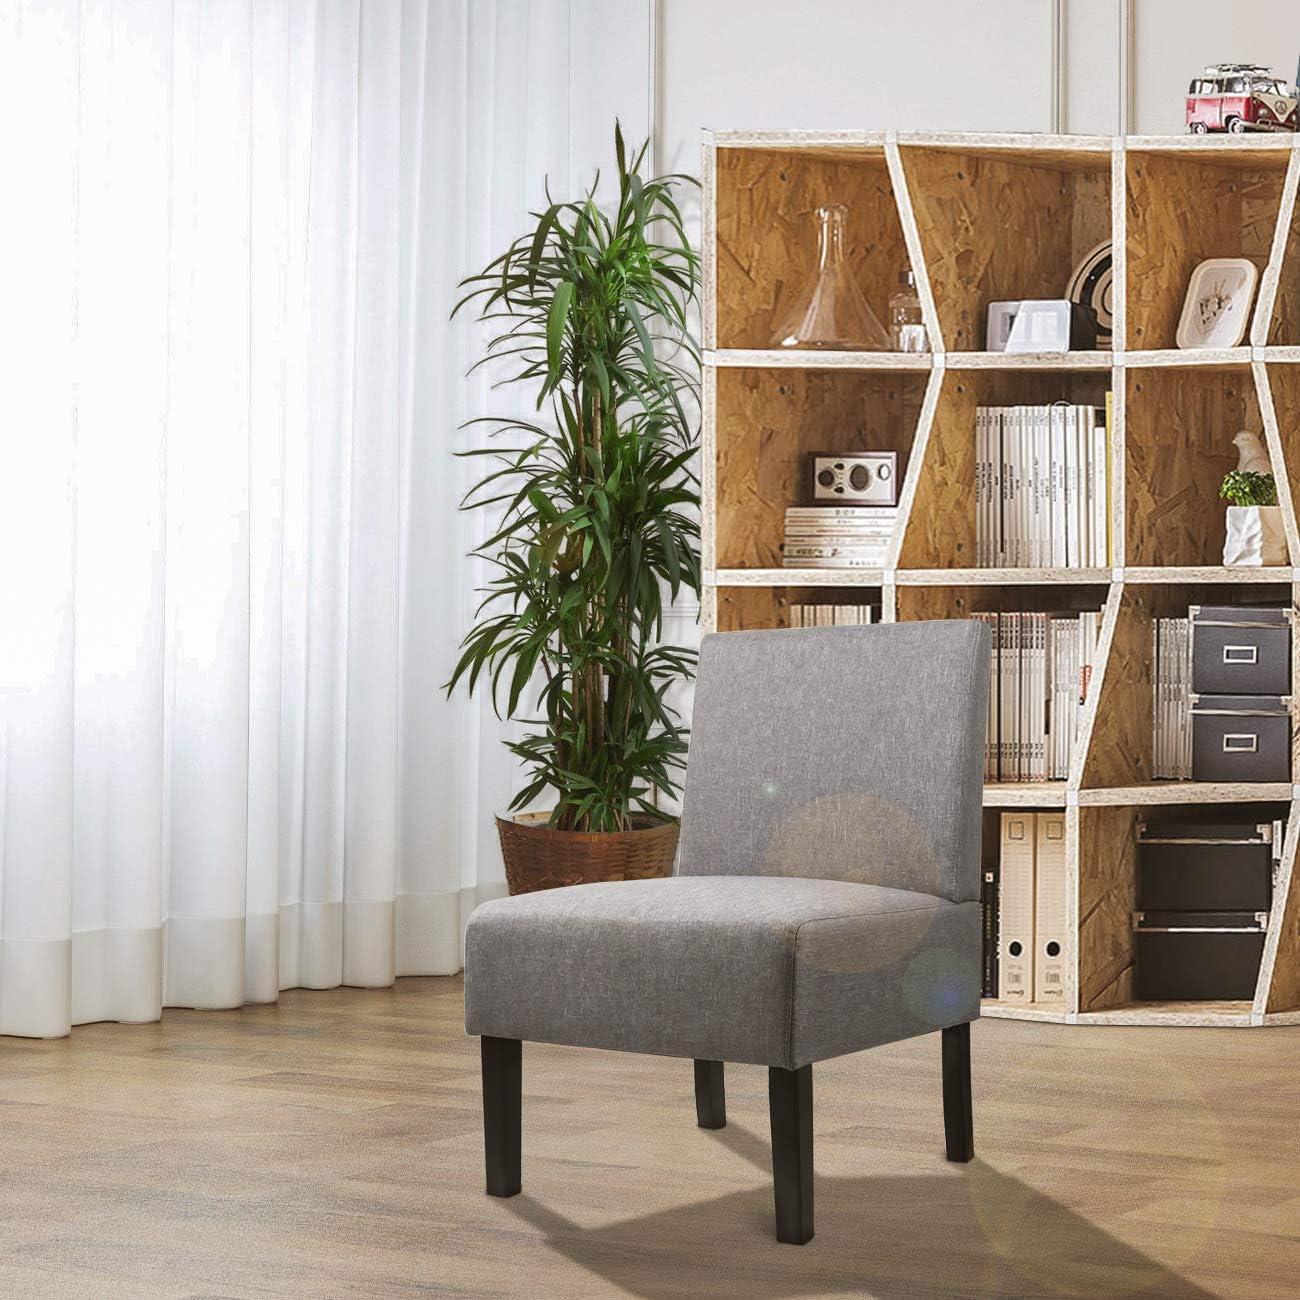 AODAILIHB Armless Accent Chair Modern Fabric Printing Leisure Chair Single Sofa Deco Living Room Bedroom Office Armless Chair